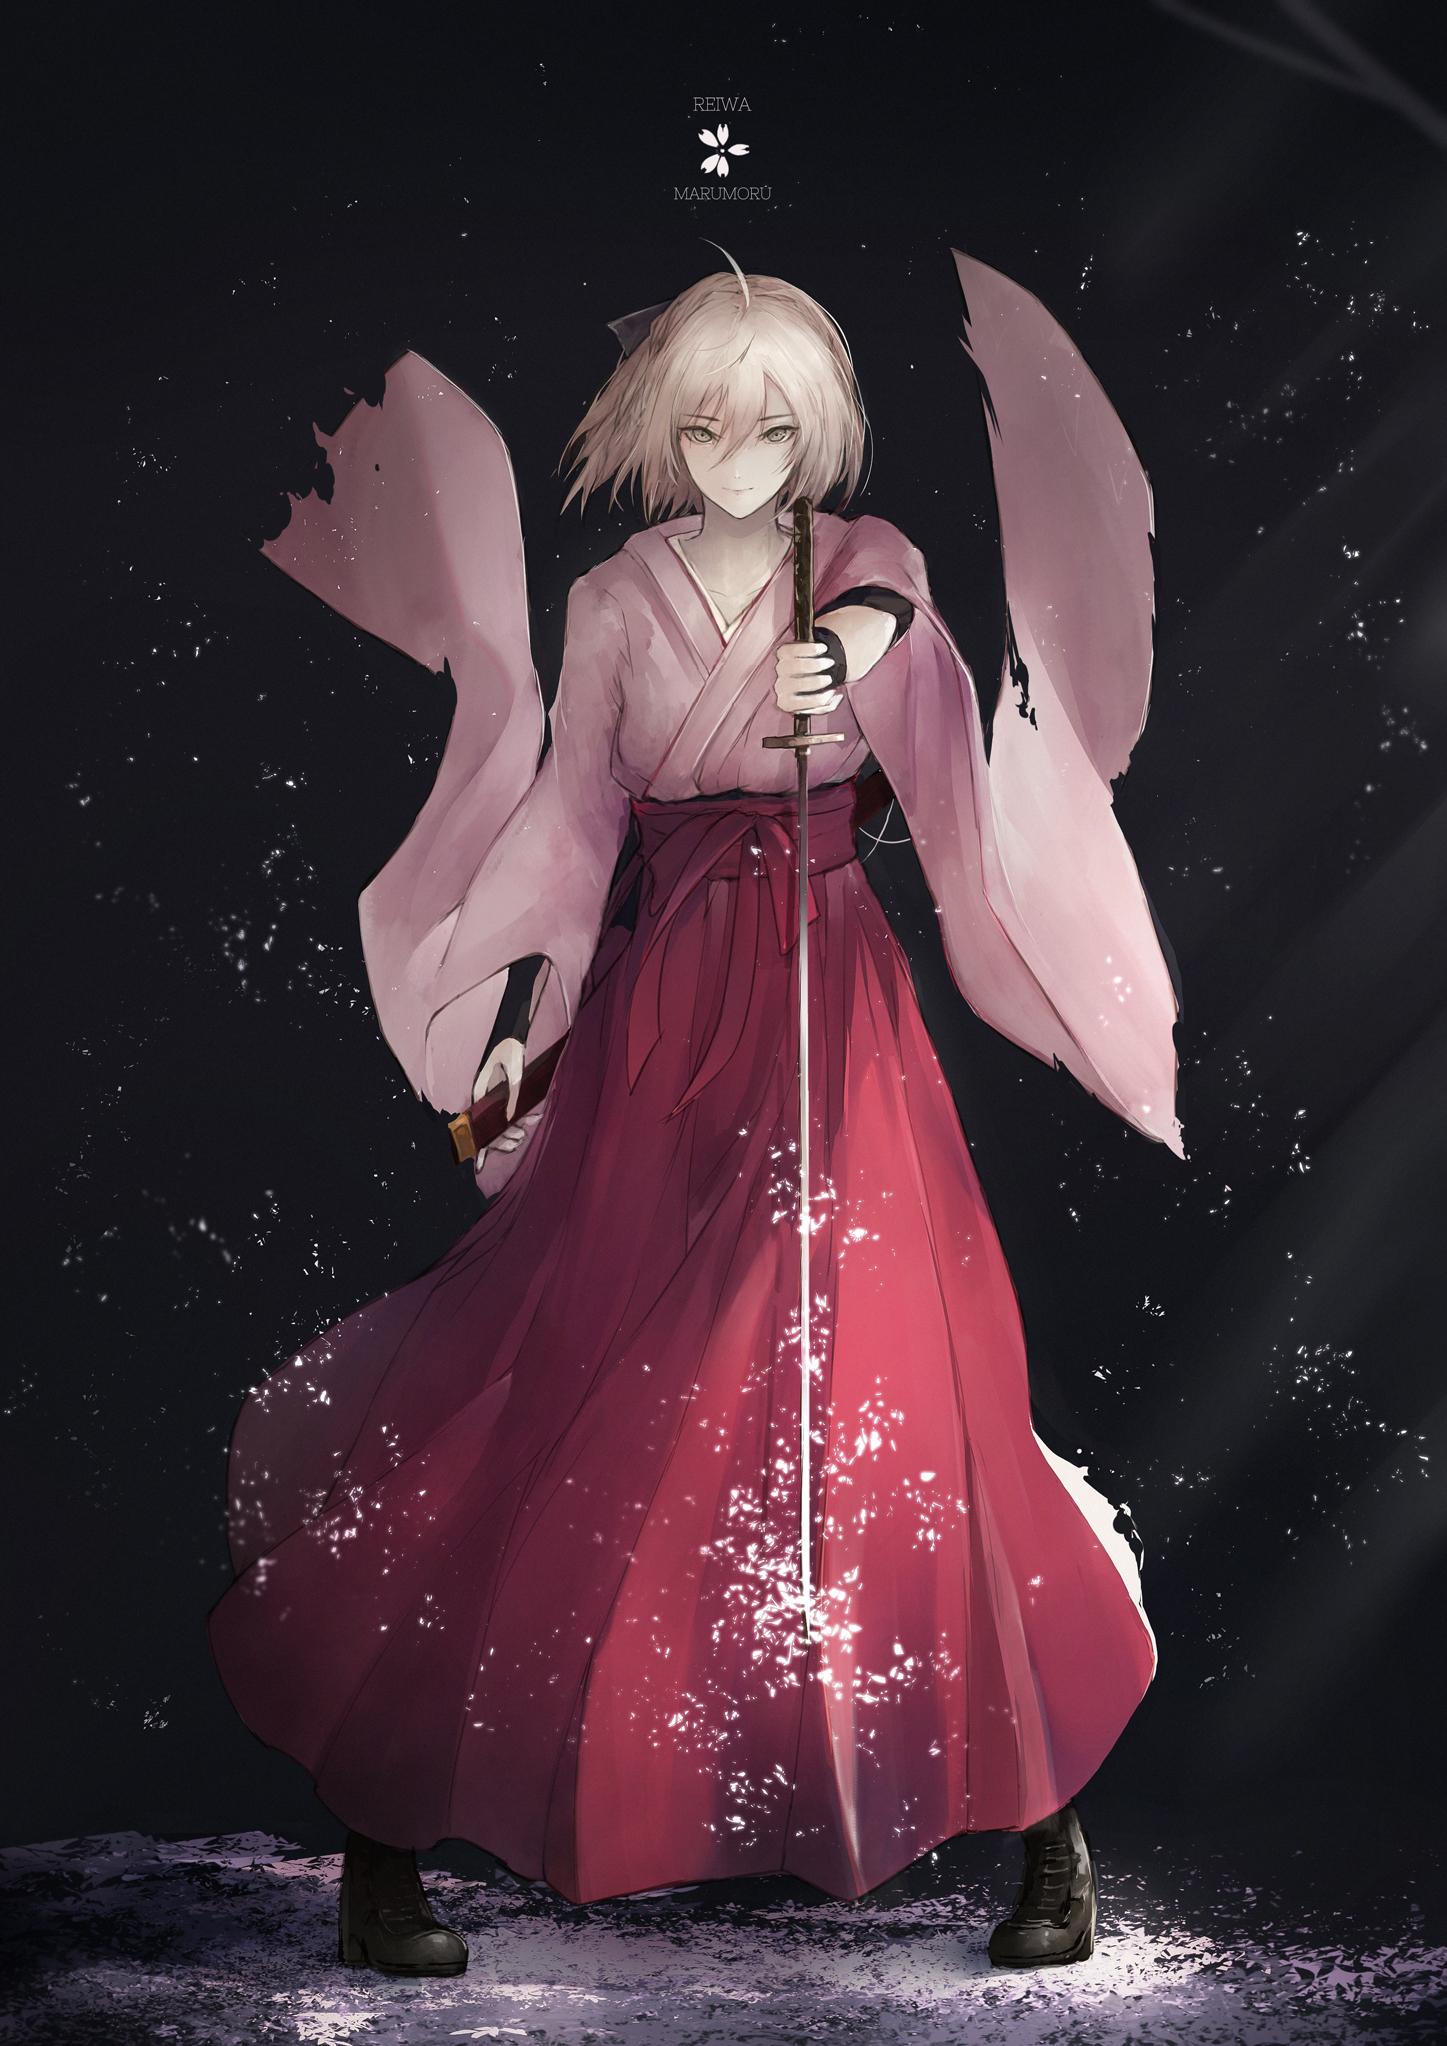 Wallpaper Anime Girls Fate Grand Order Souji Okita Fate